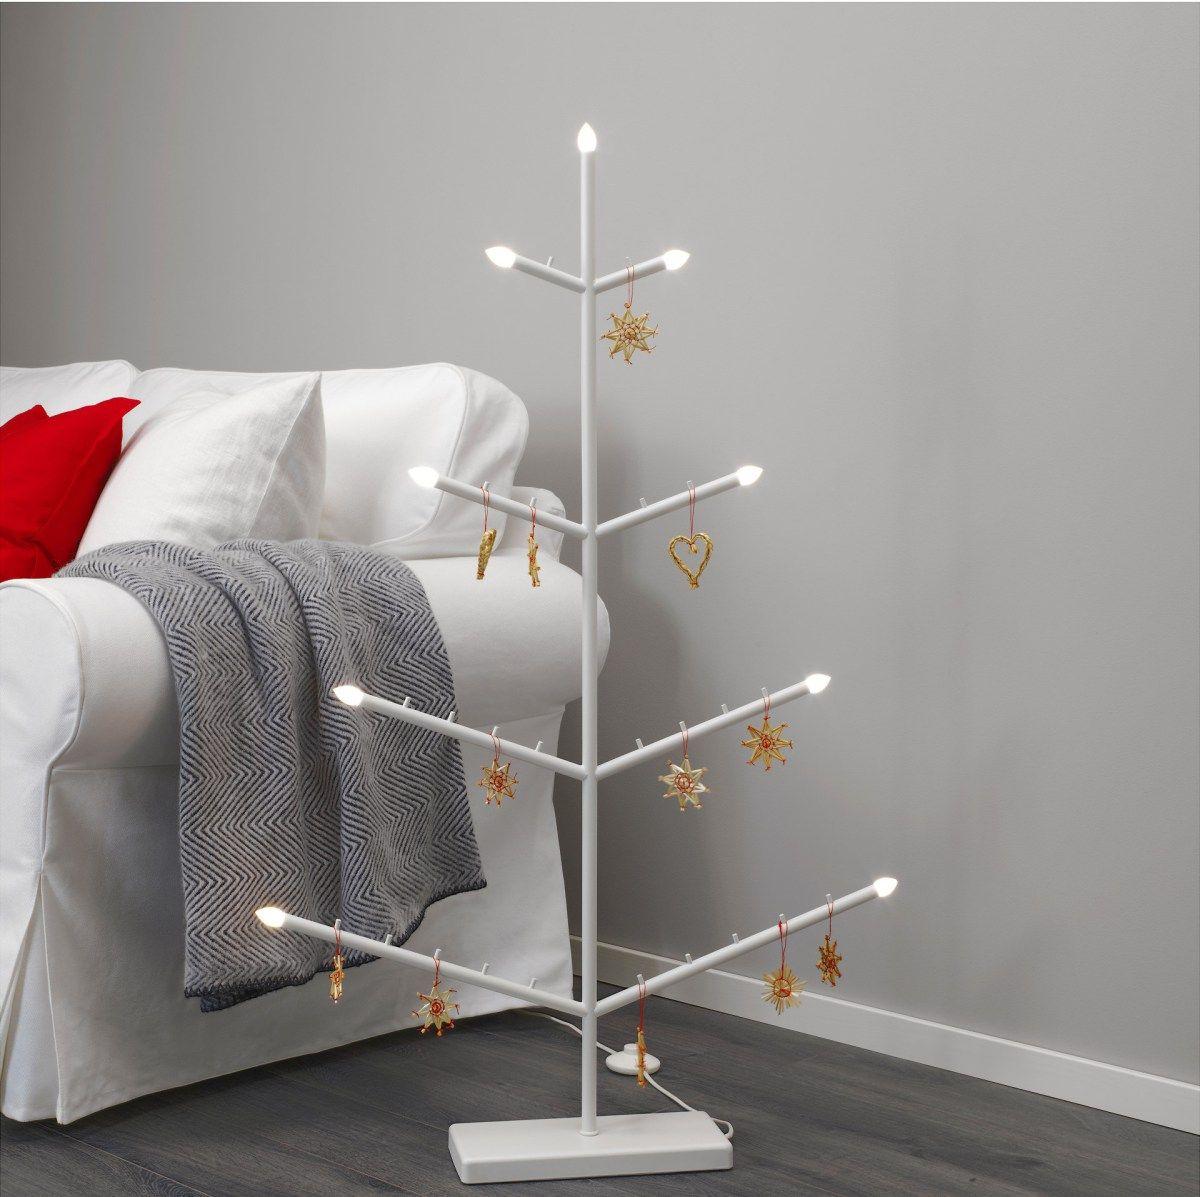 10 Last Minute Ikea Christmas Decor Ideas Ikea Christmas Floor Candelabra Ikea Christmas Tree